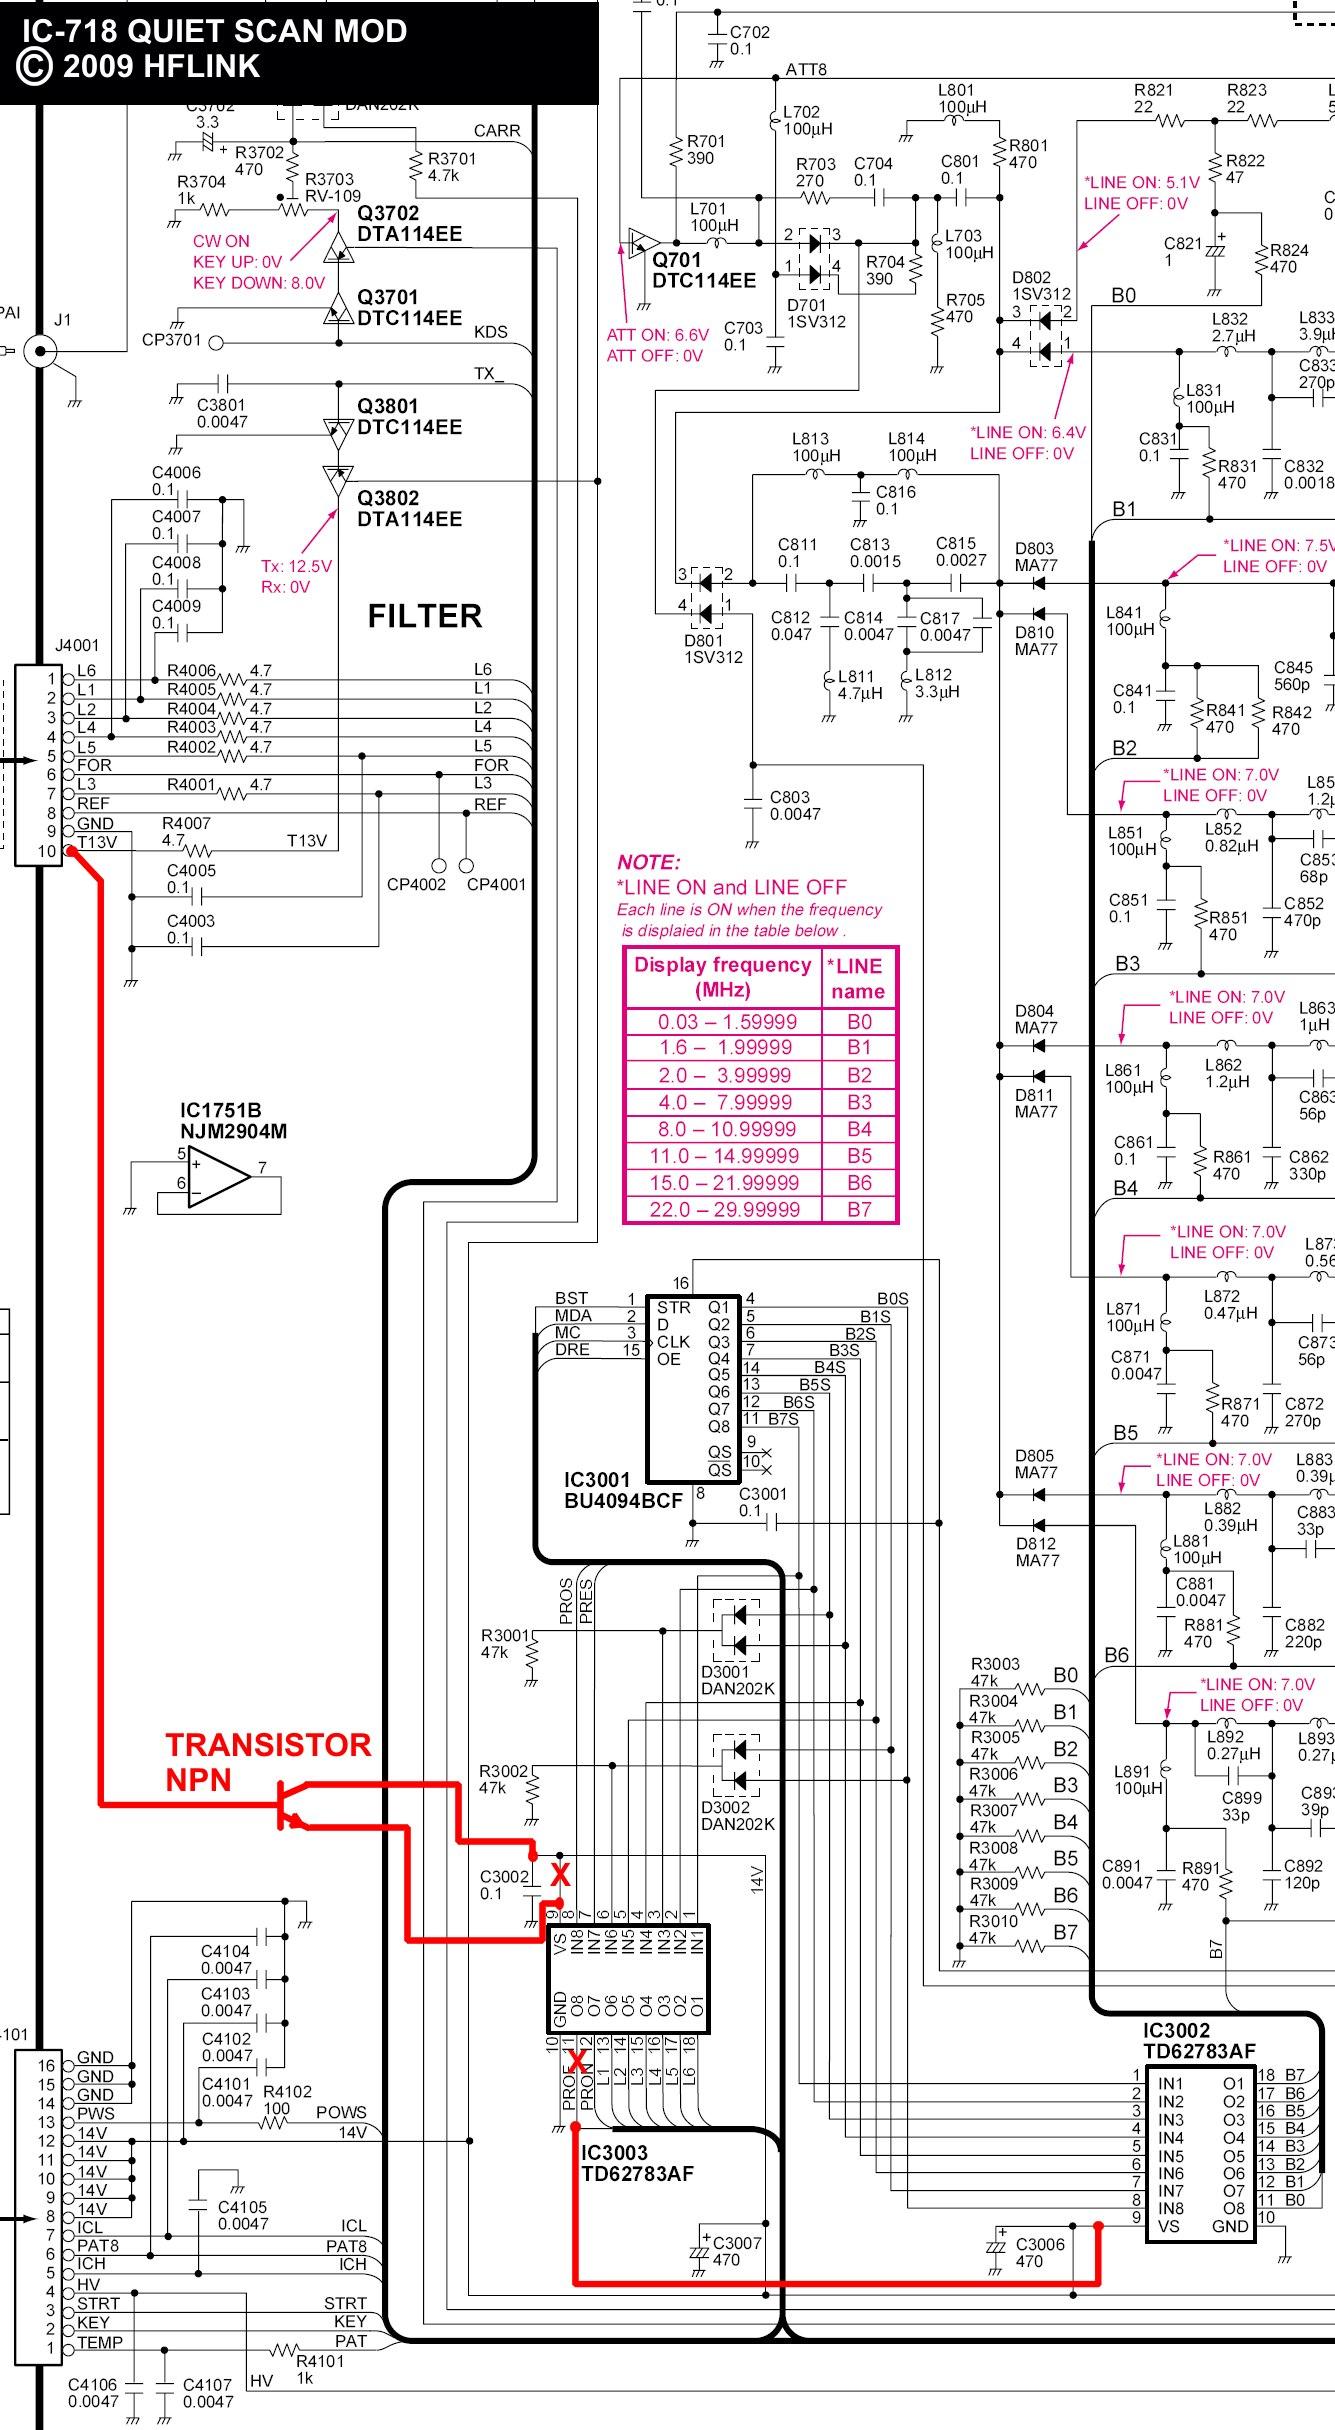 New Circuits Page 138 Com Circuitdiagram Signalprocessing Oscillatorcircuit Thequartz Ic718